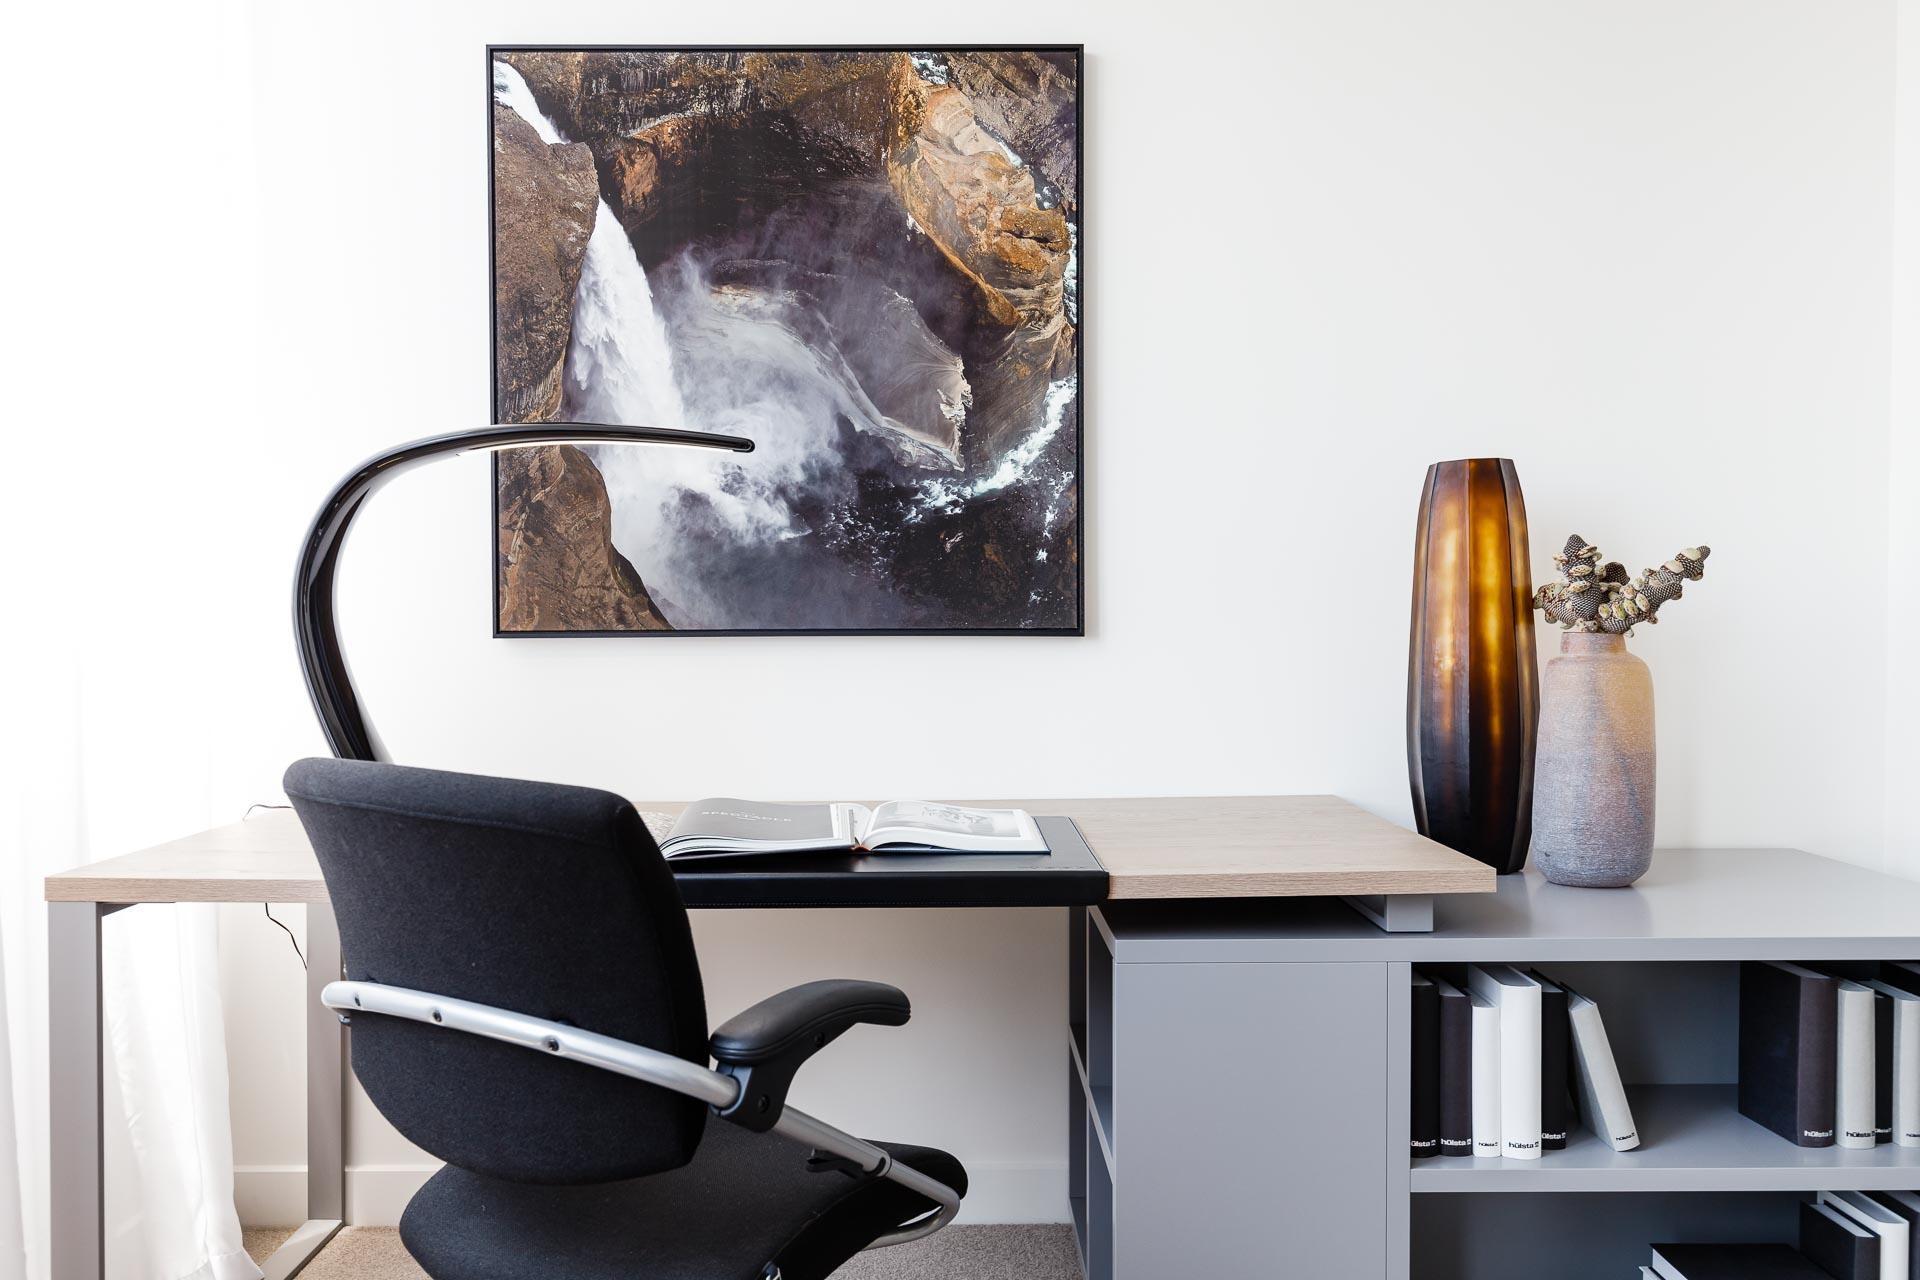 WEB - Architectural Photography Sydney - Open House Perth 2018  - Sebastian Photography 83.jpg